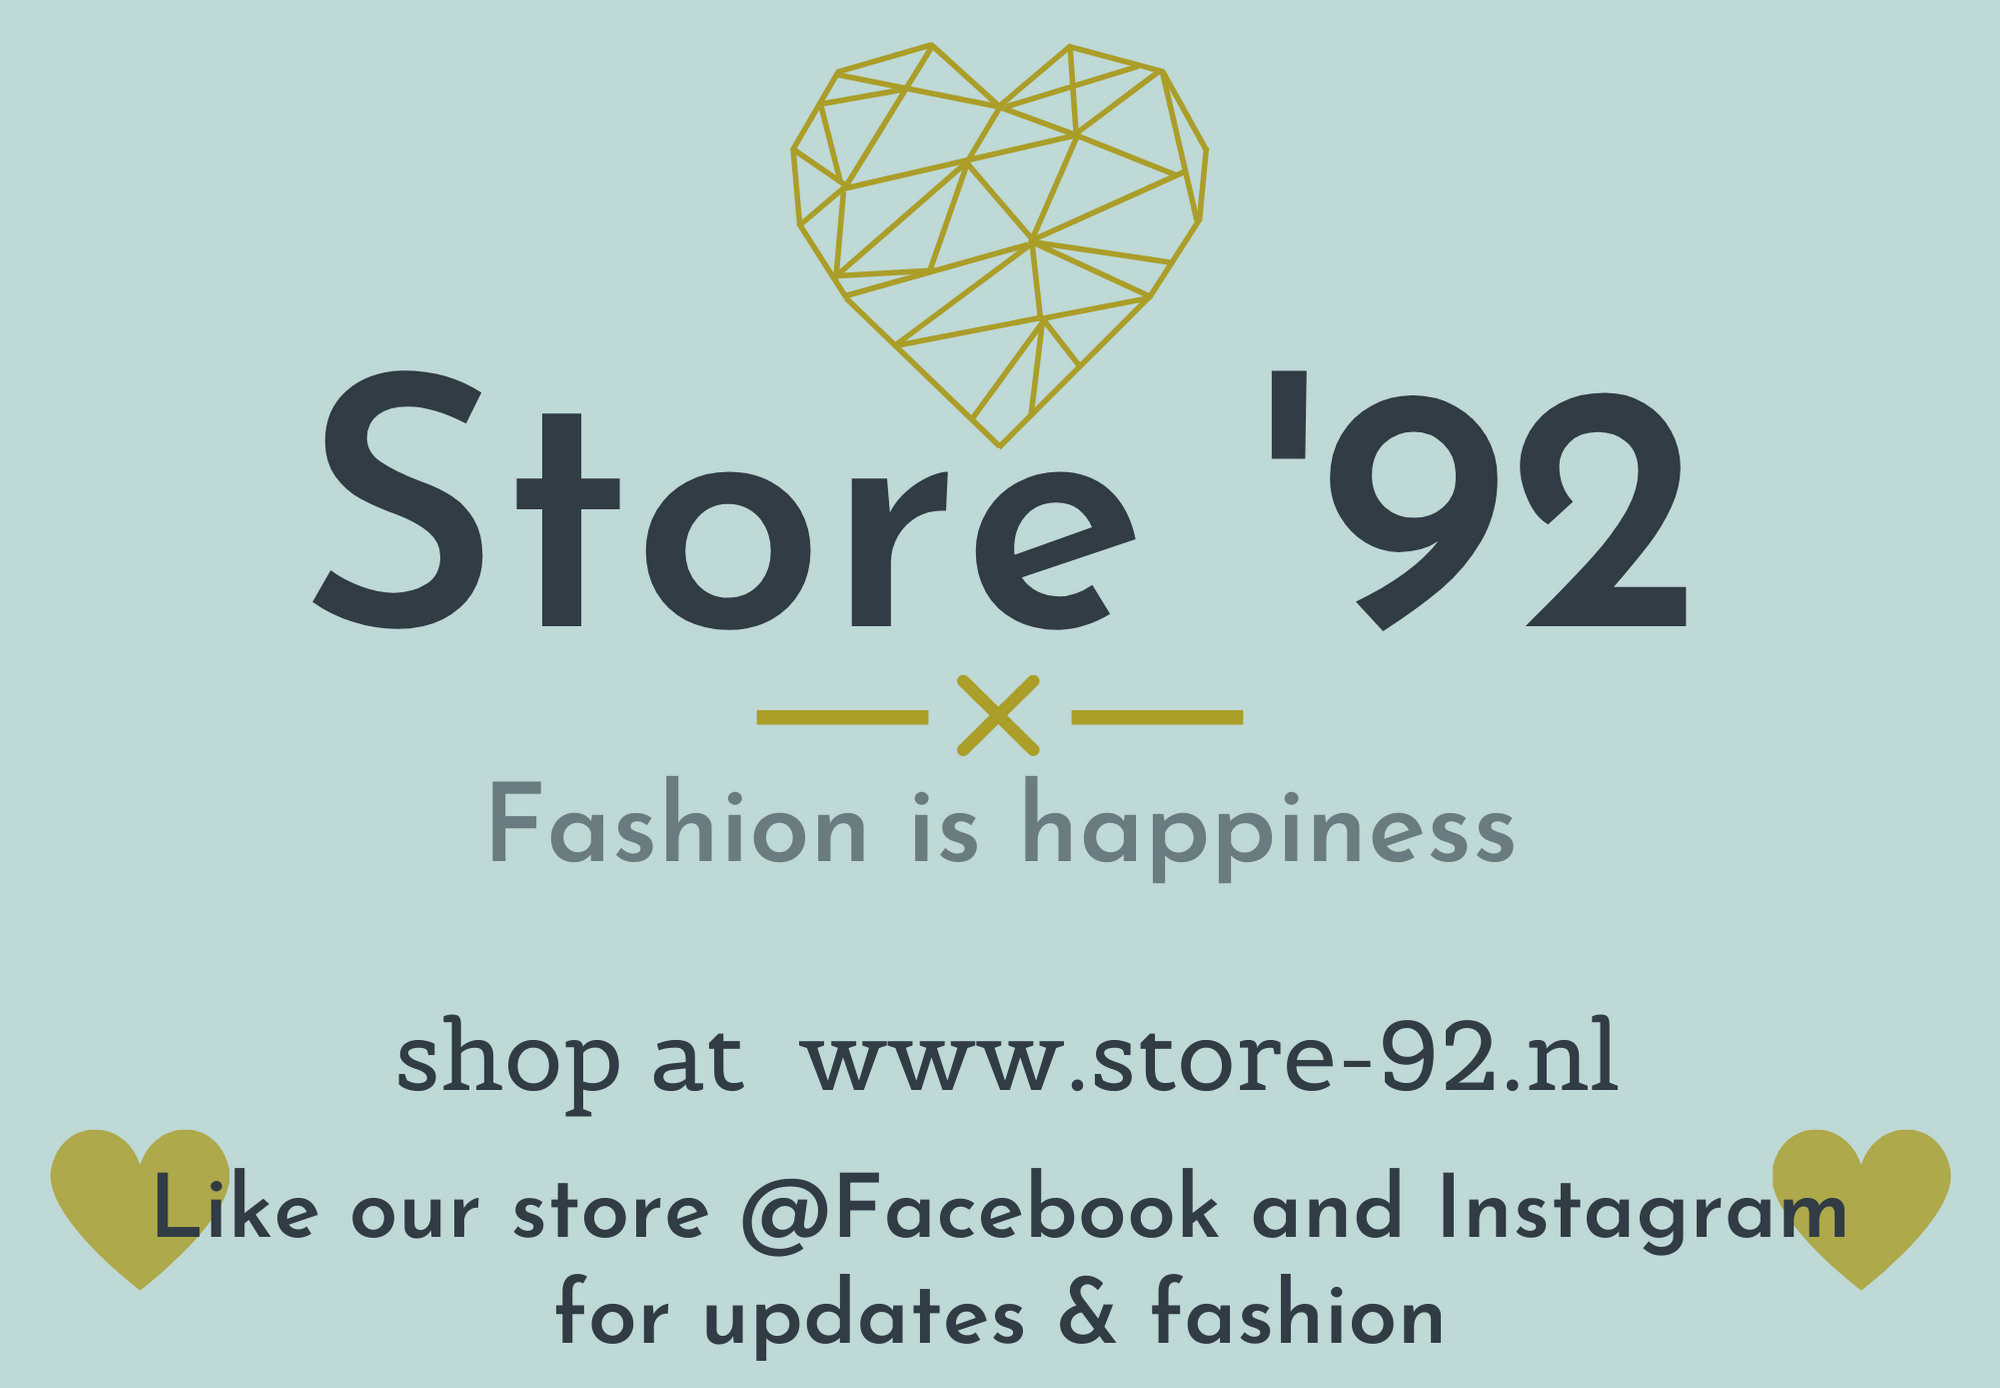 Logo_Store_92_180x125_definitief